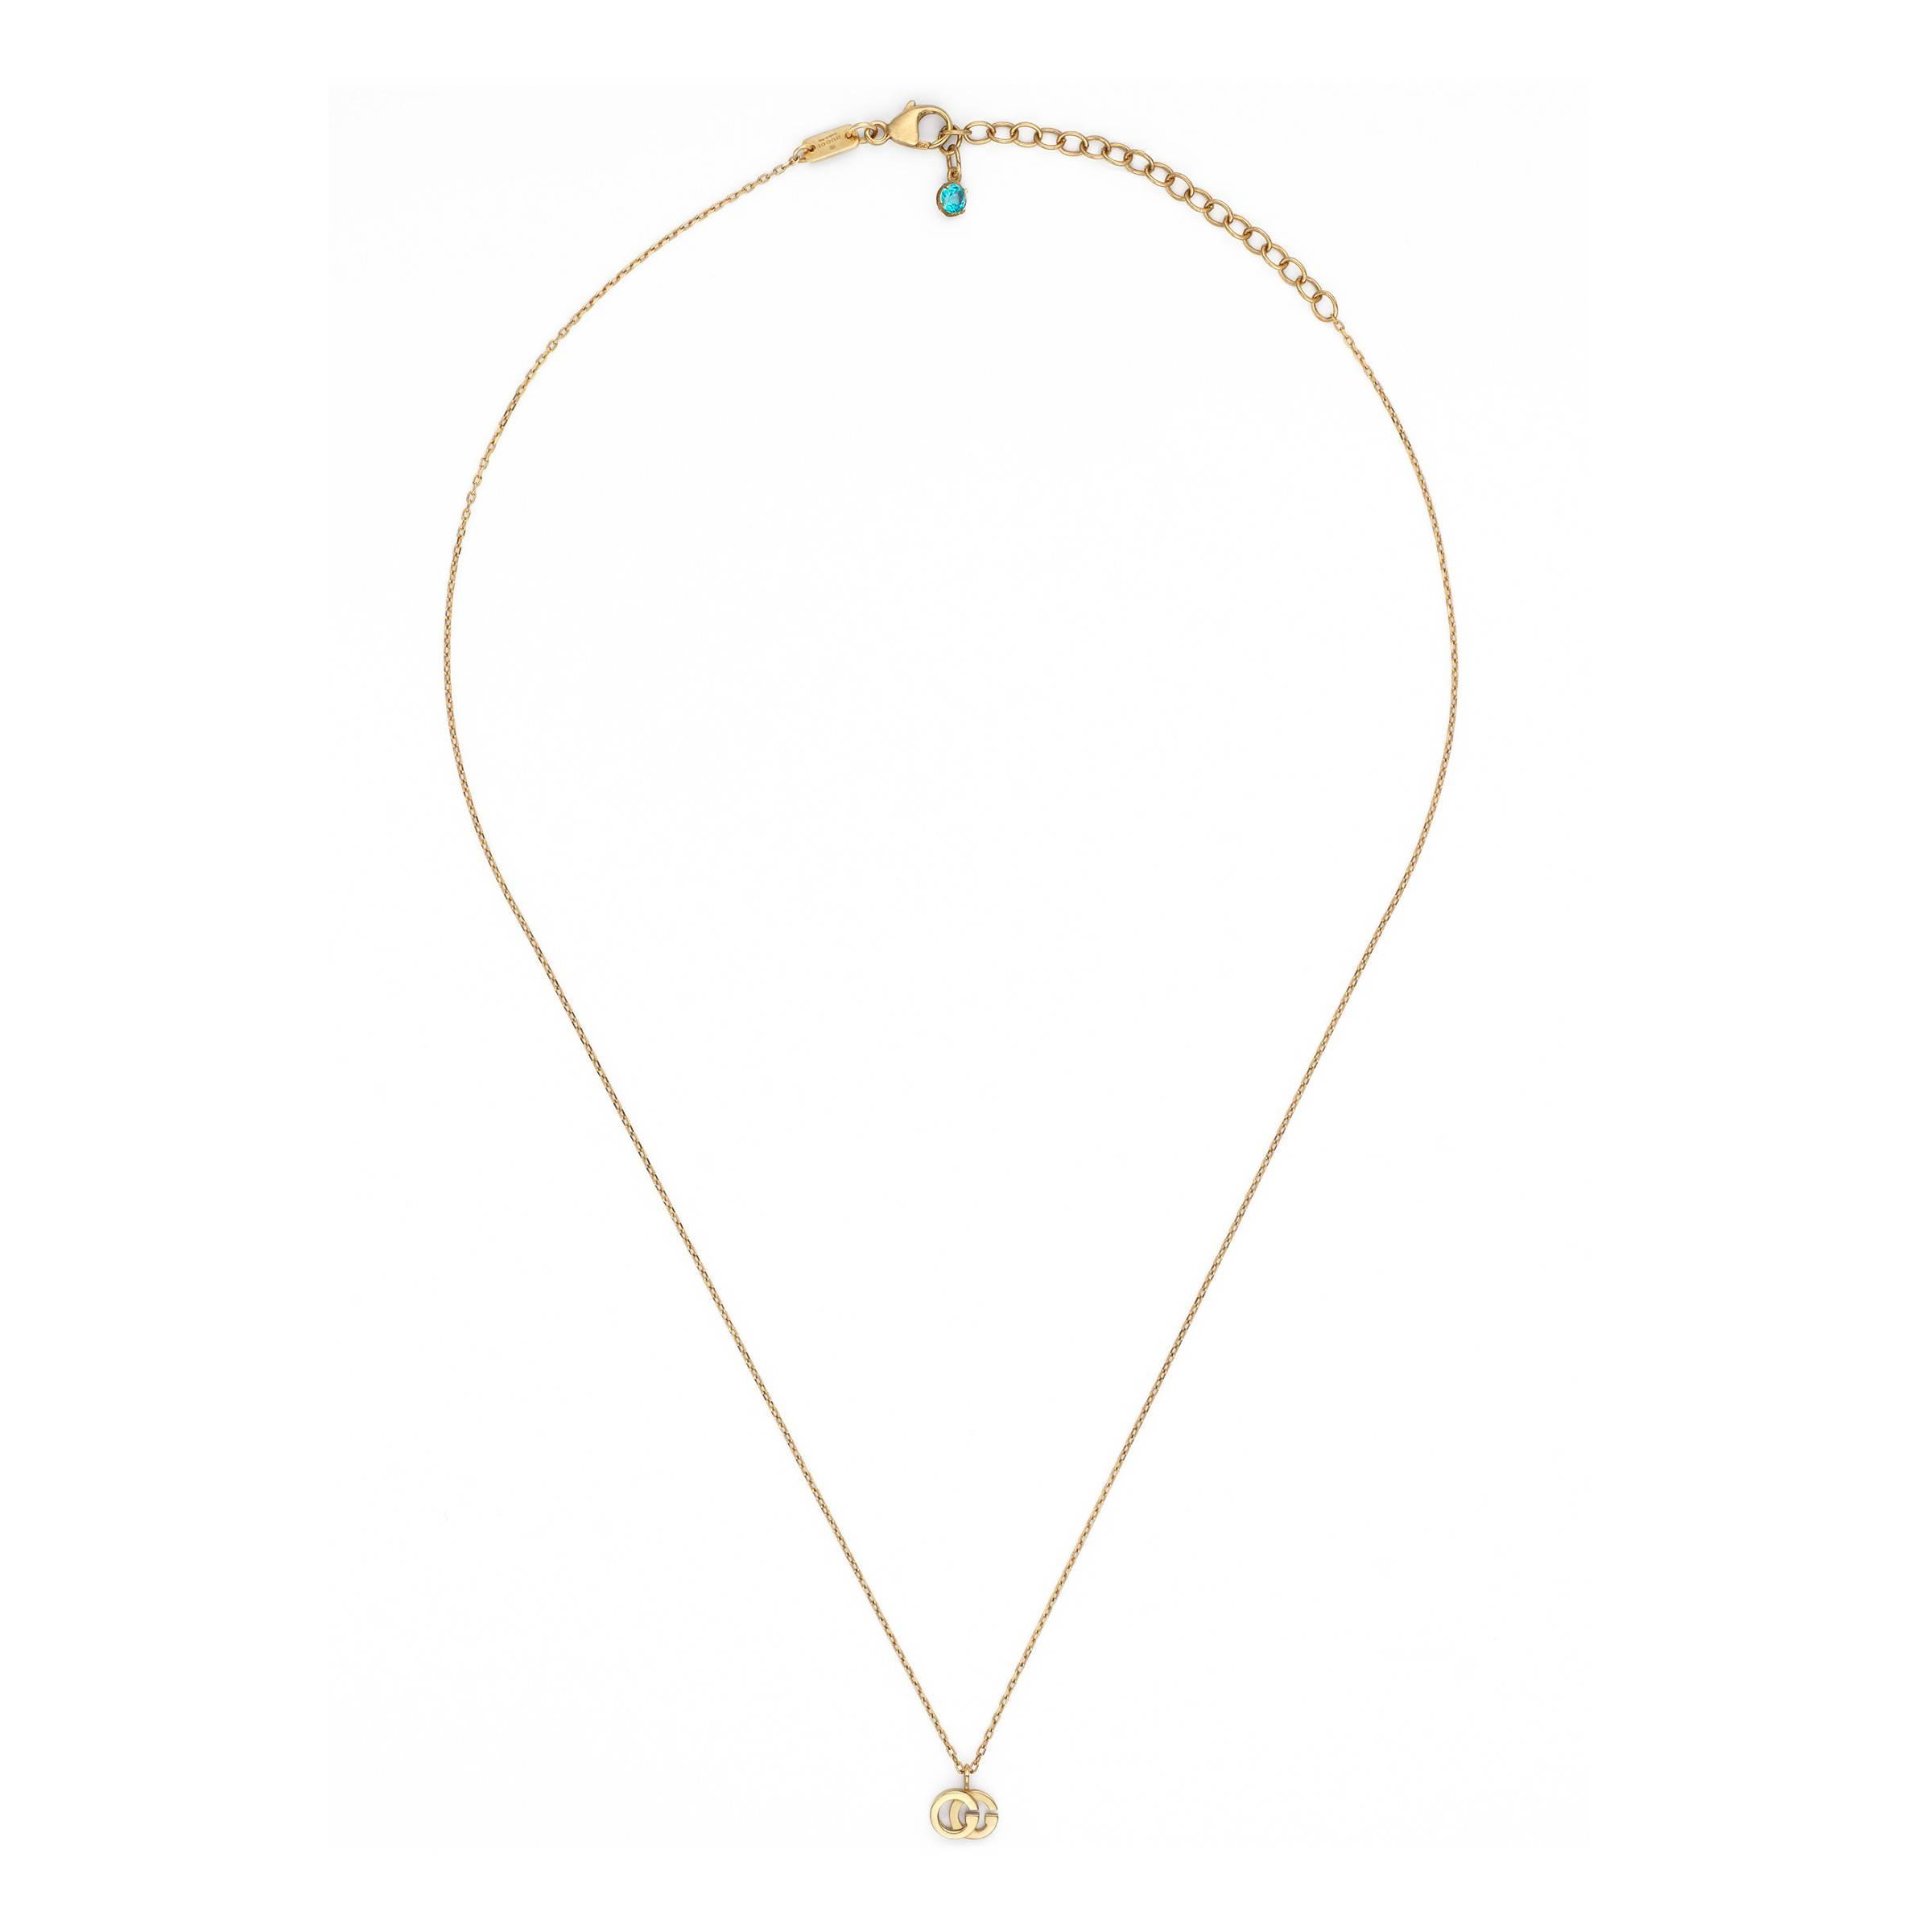 3ea27a637f3b Collar Doble G con Topacio Gucci de color Metálico - Lyst